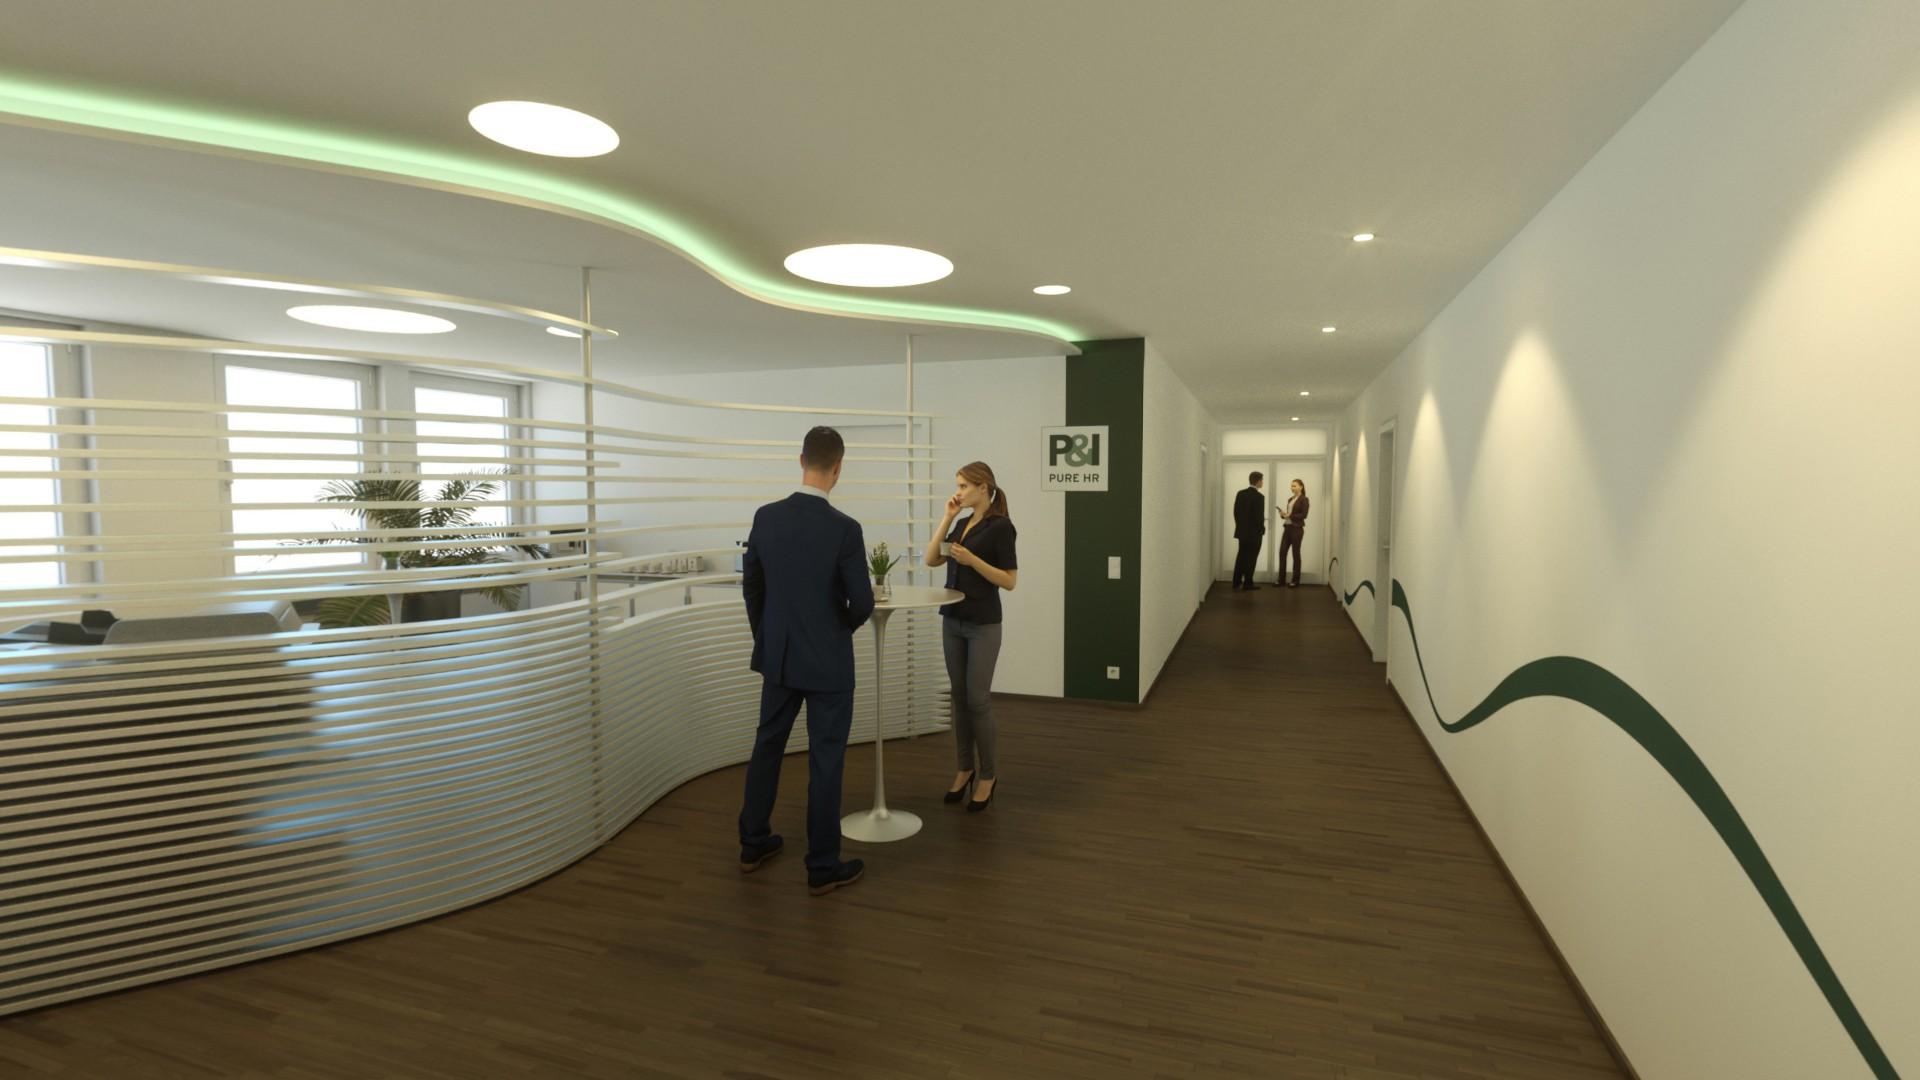 P&I Visualisierung Plankosmos Lounge